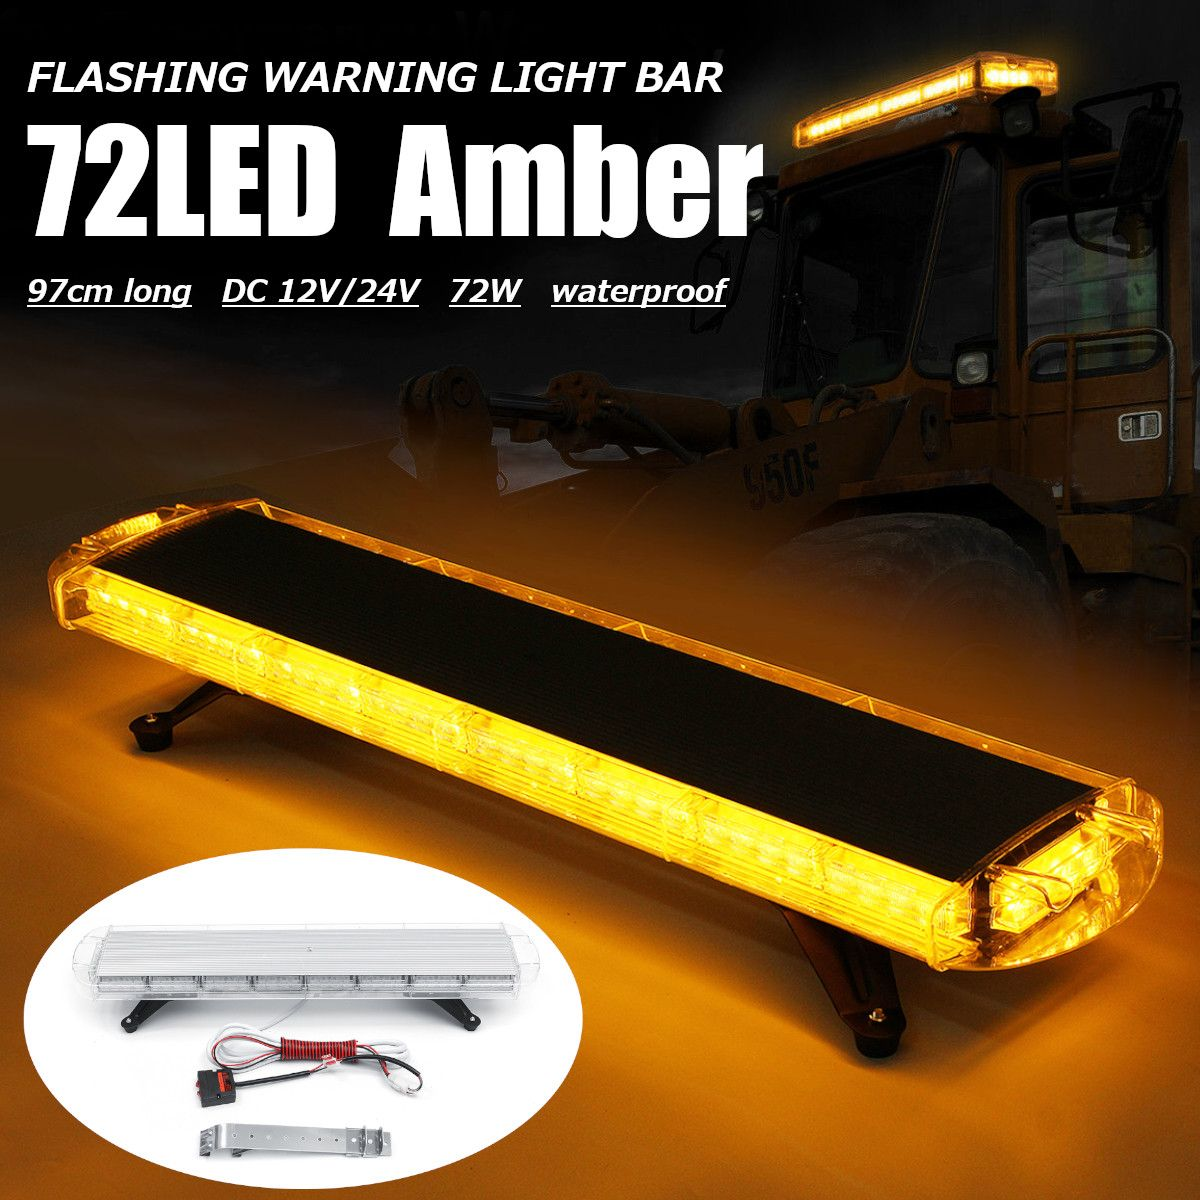 40Inch 72W 72 LED Signal Light Car Strobe Emergency Amber Lights Bar Beacon Hazard Warning Flash Lamp Waterproof